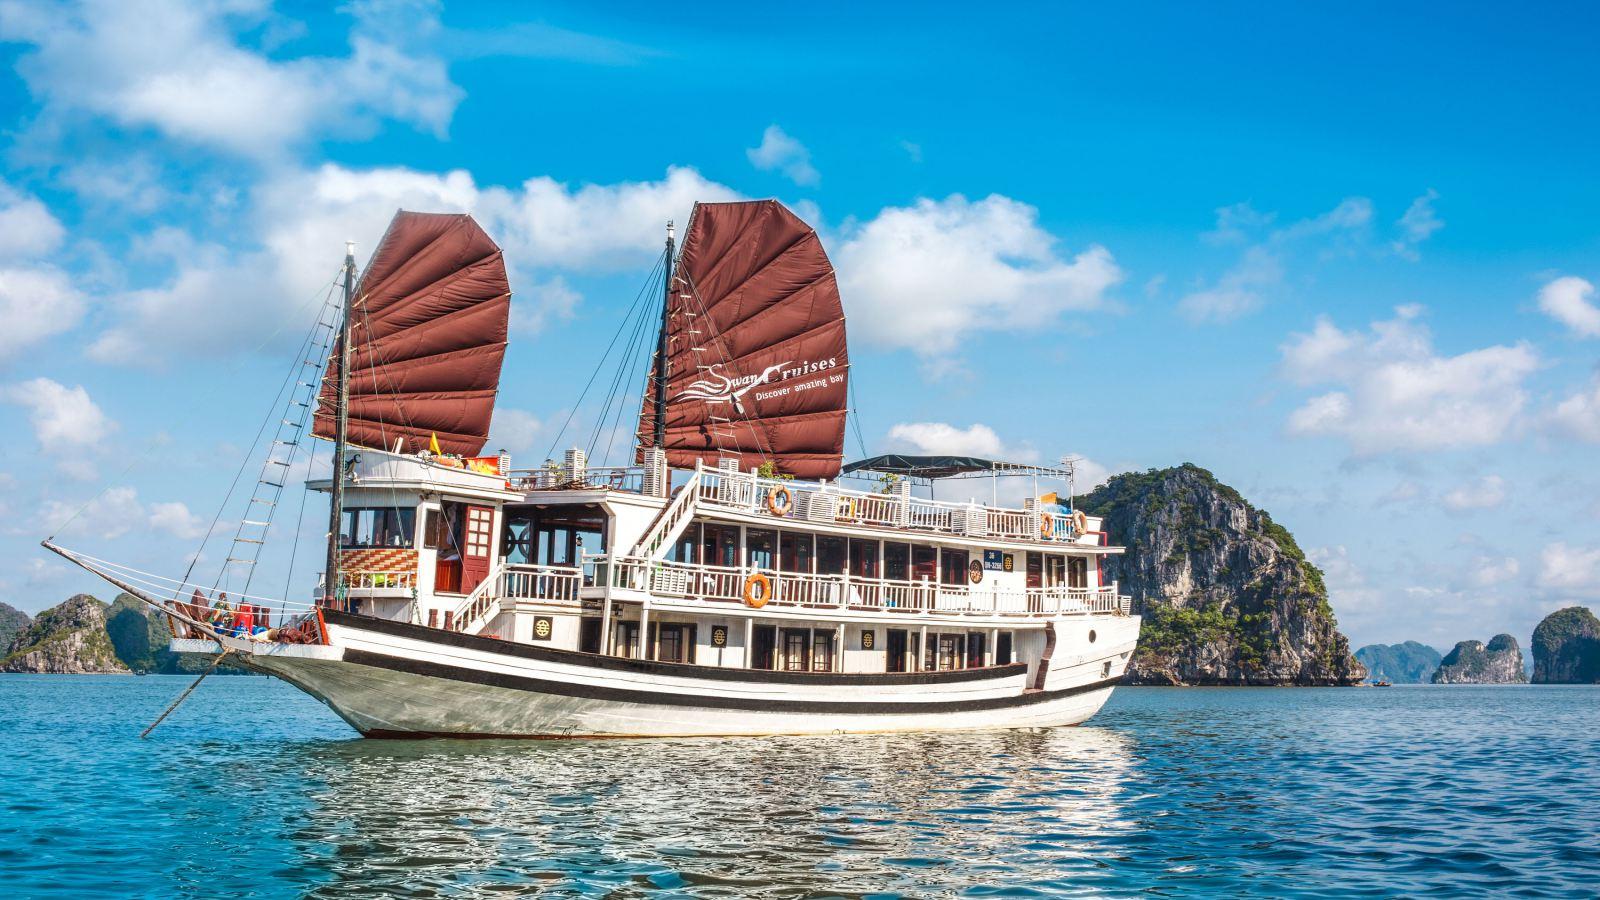 Halong Bay Cruise from Cat Ba